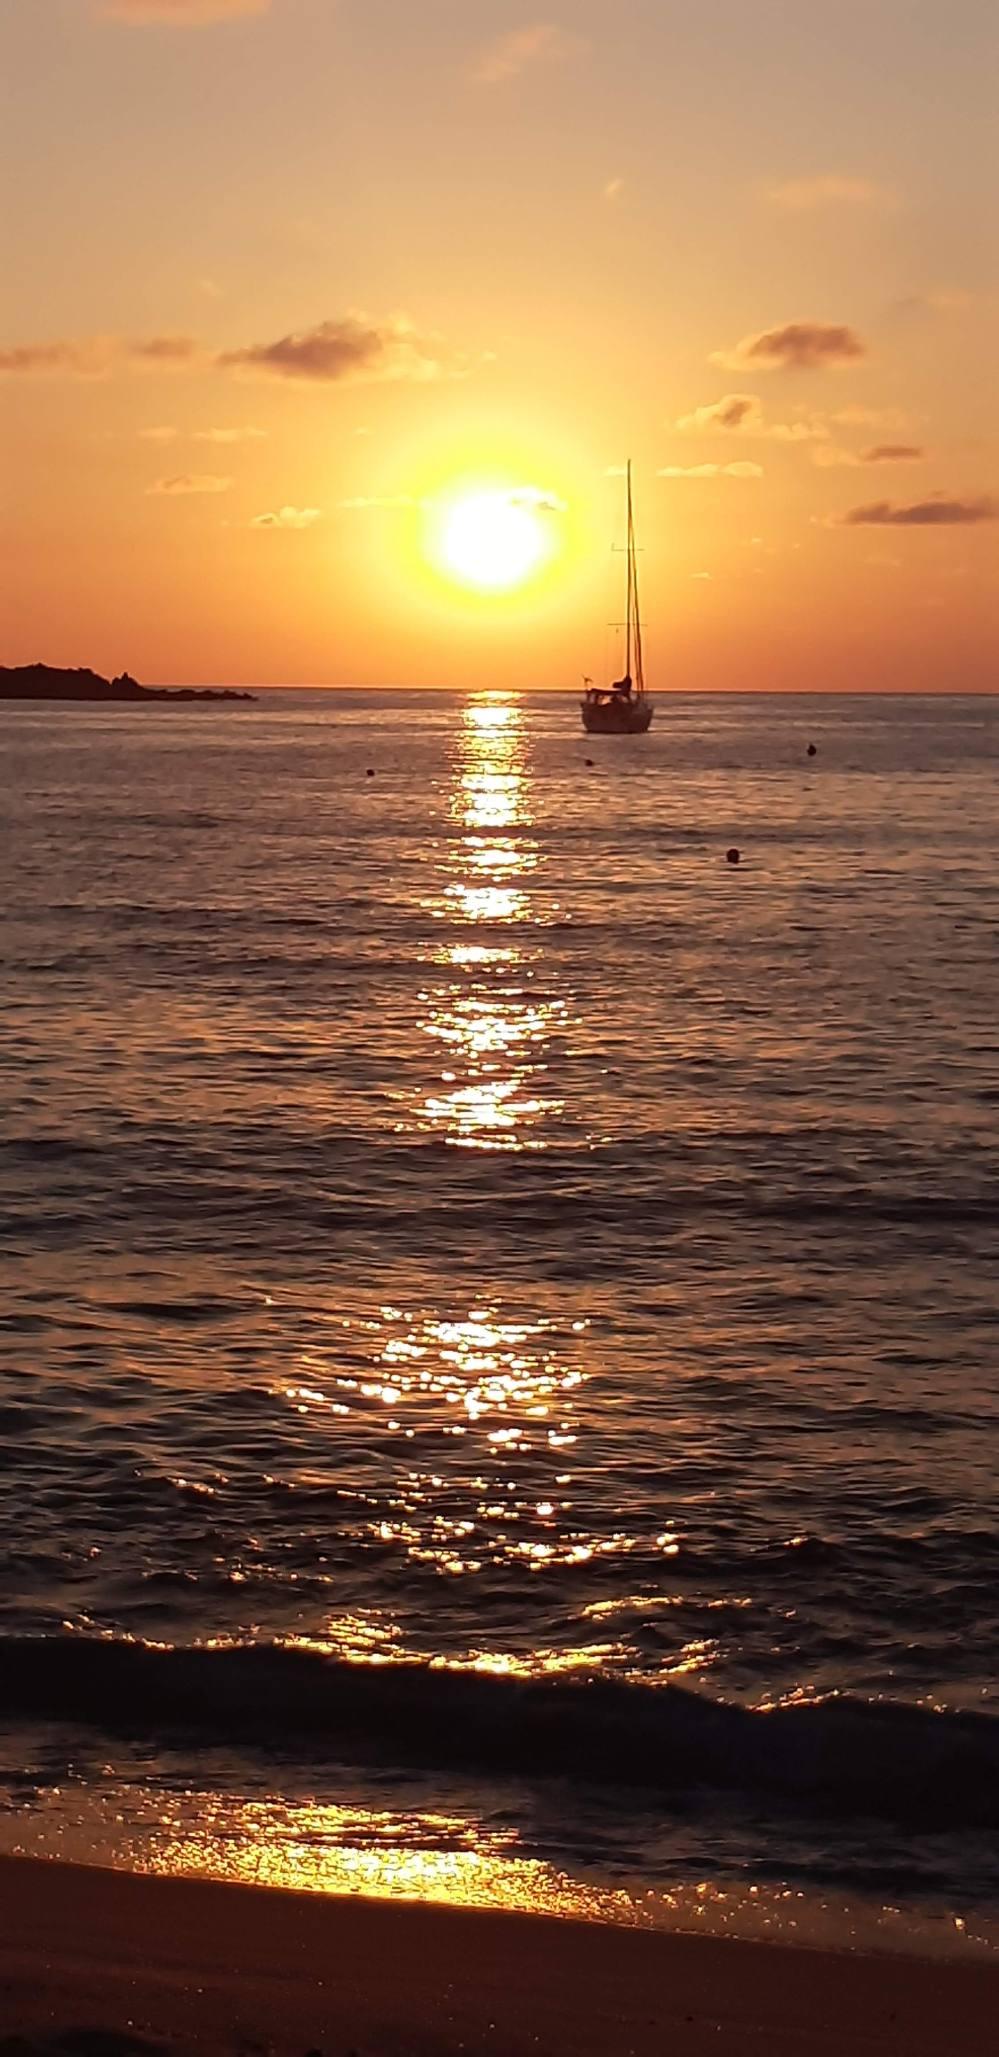 Isola Rossa Sardegna-Isola Rossa-Sardegna-Viaggio in Sardegna-Tramonto in Sardegna-Mare Sardegna-Spiagge Sardegna-Blog Viaggi